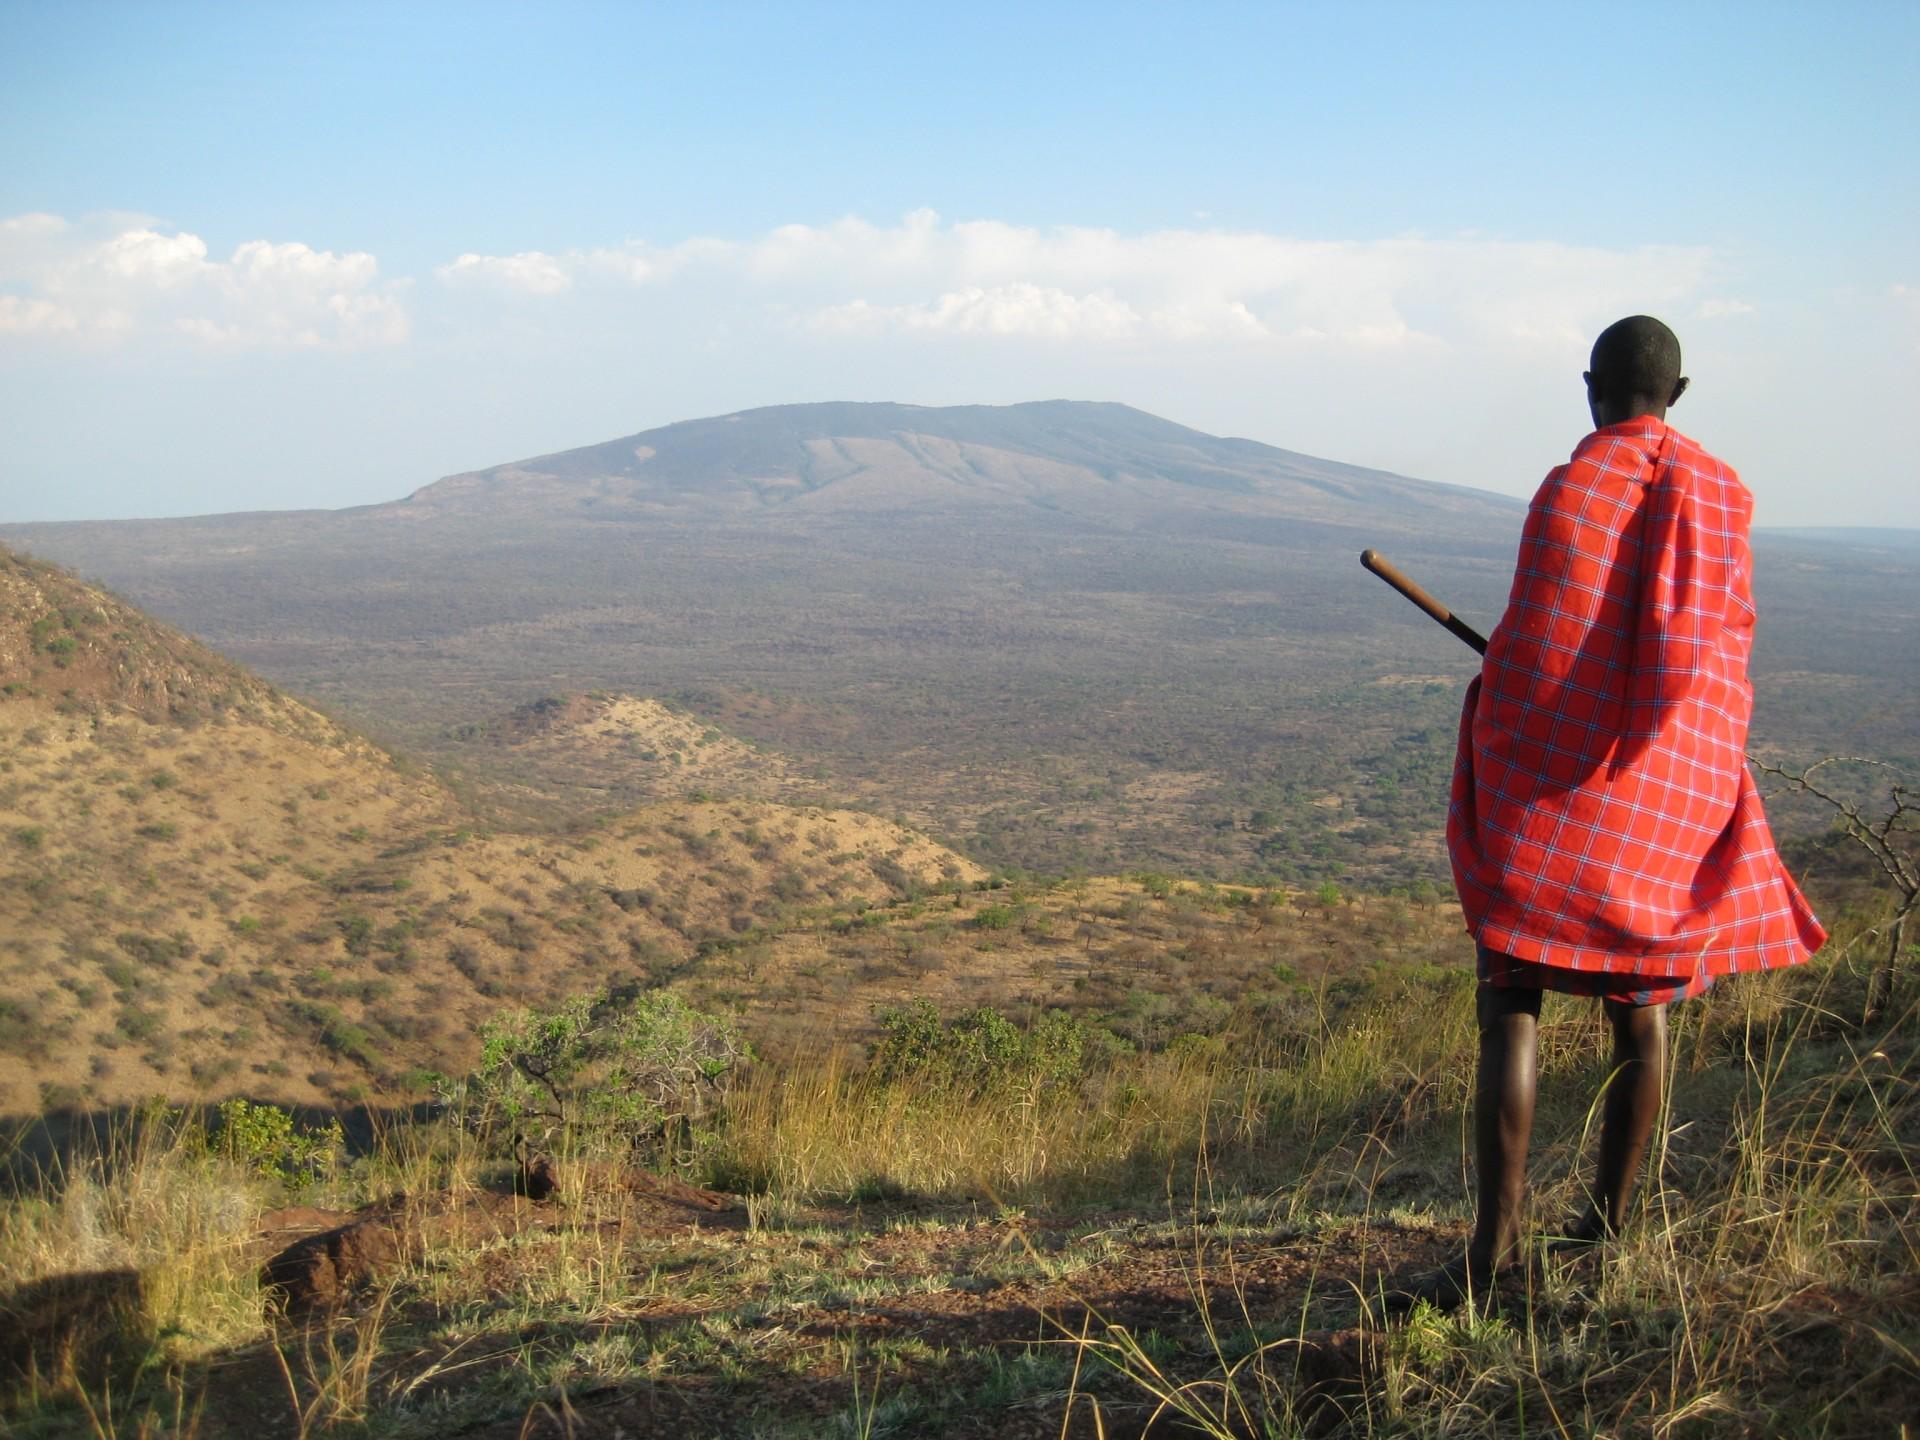 Loita Maasai in Kenia